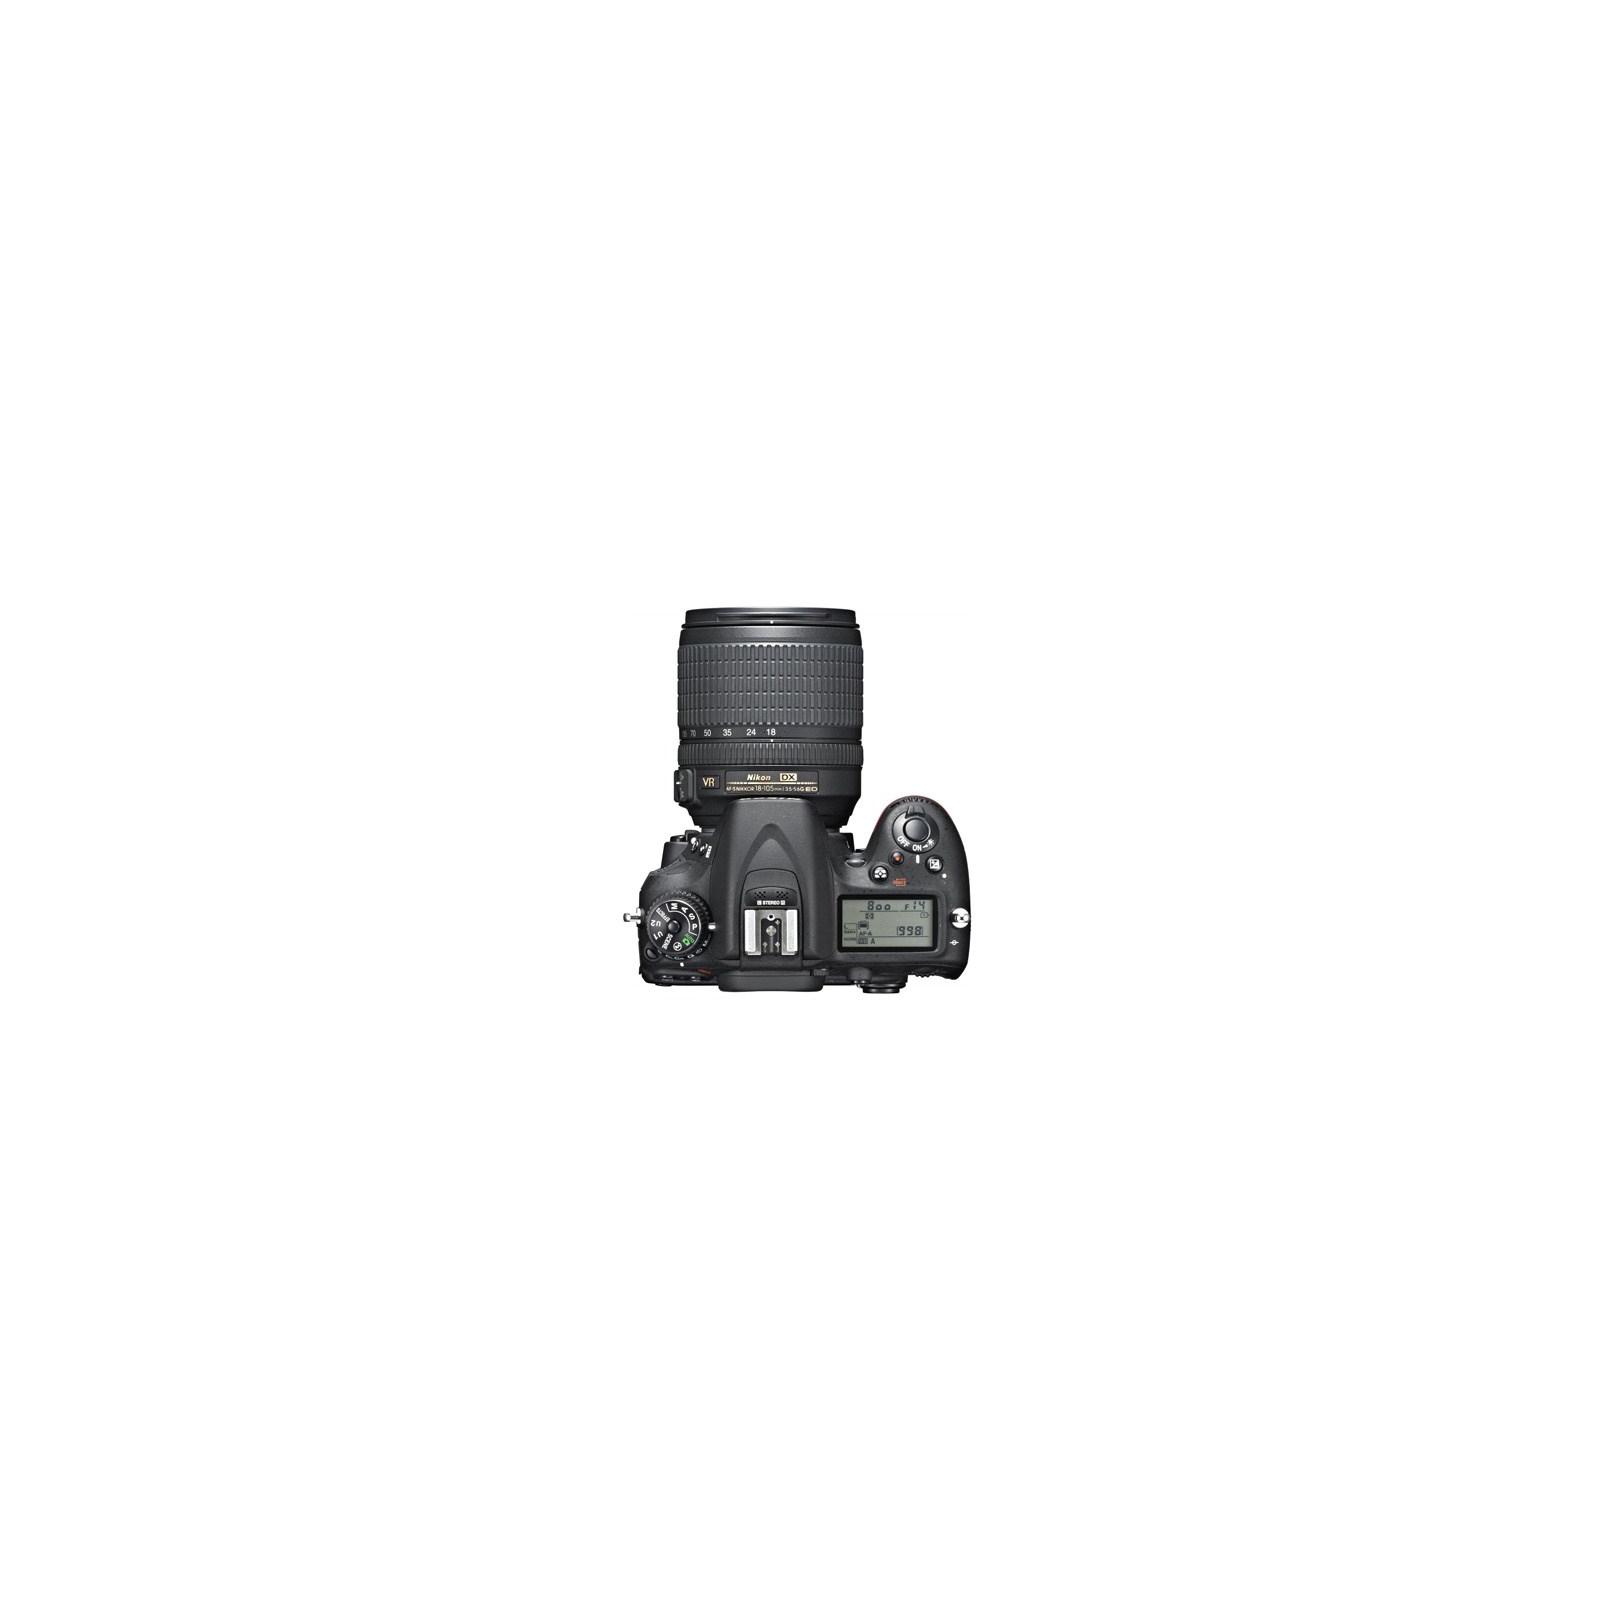 Цифровой фотоаппарат Nikon D7100 18-105 VR kit (VBA360K001) изображение 2